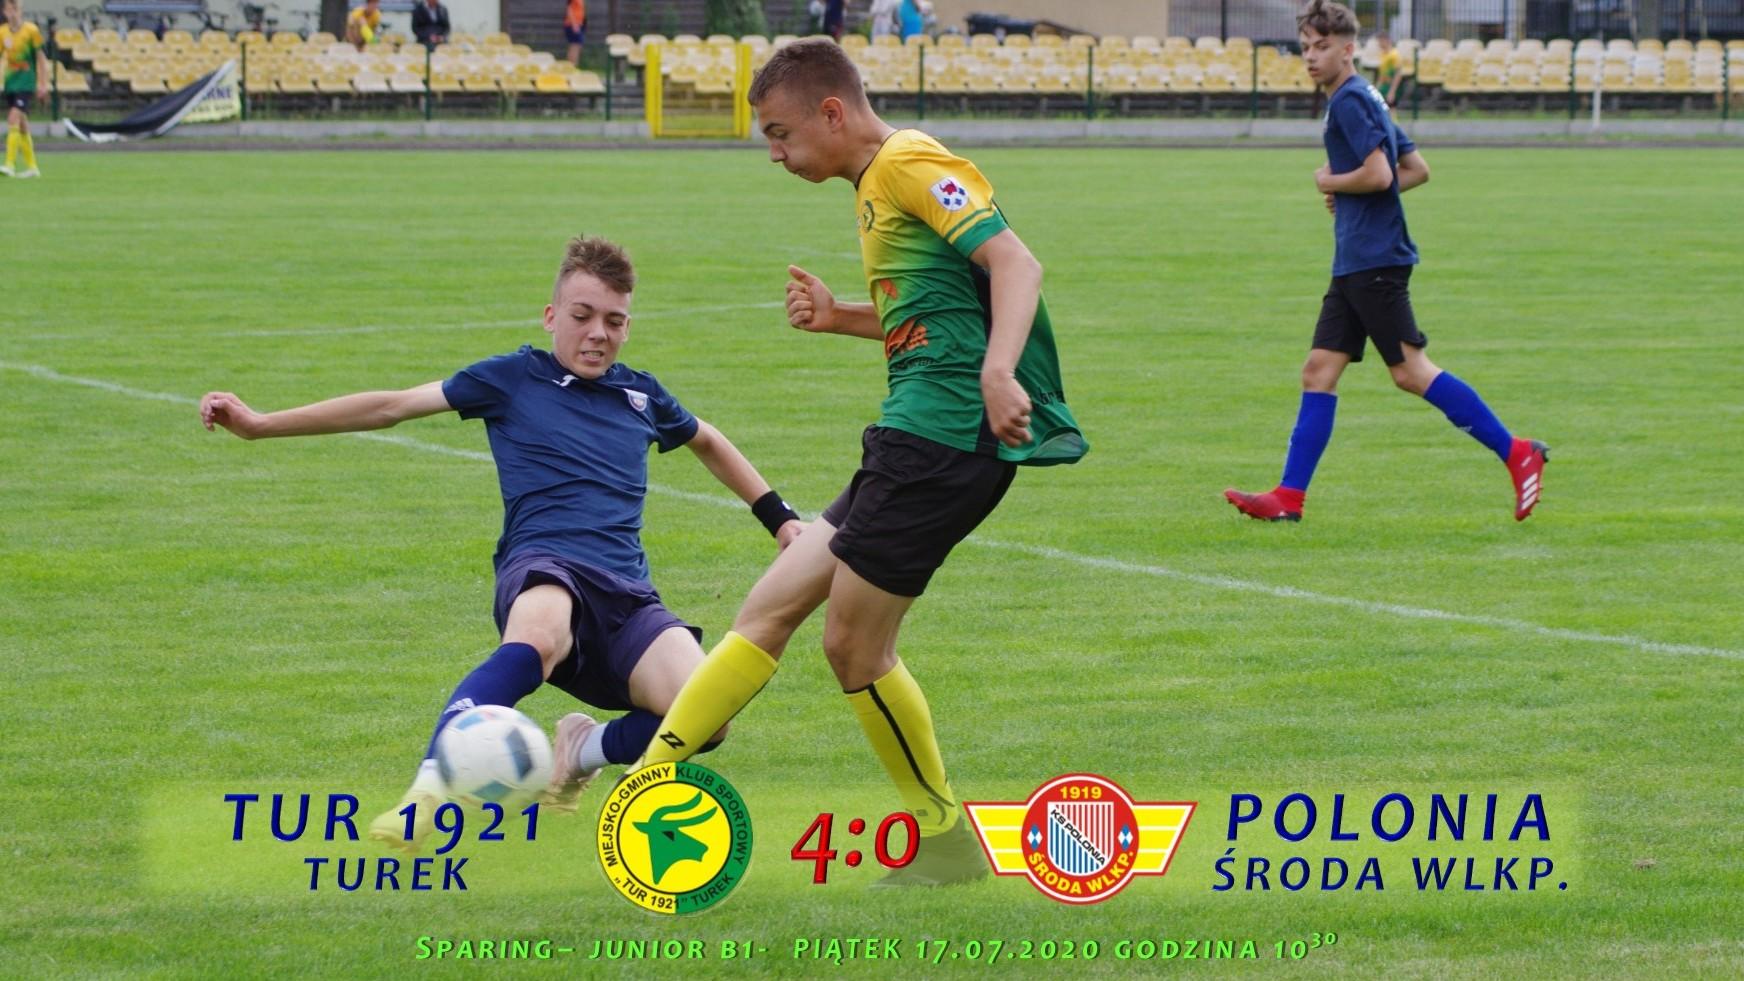 Tur 1921 Turek- Polonia Środa Wlkp. (2005) 4:0, sparing B1